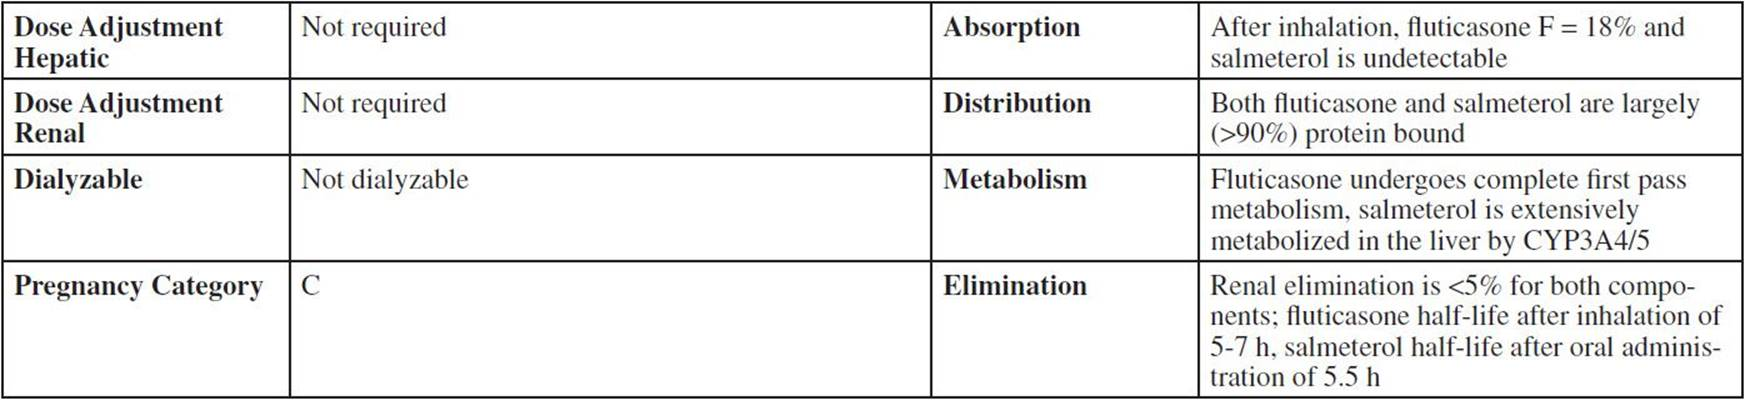 Fluticasone Salmeterol Advair Diskus Advair Hfa Top 300 Pharmacy Drug Cards